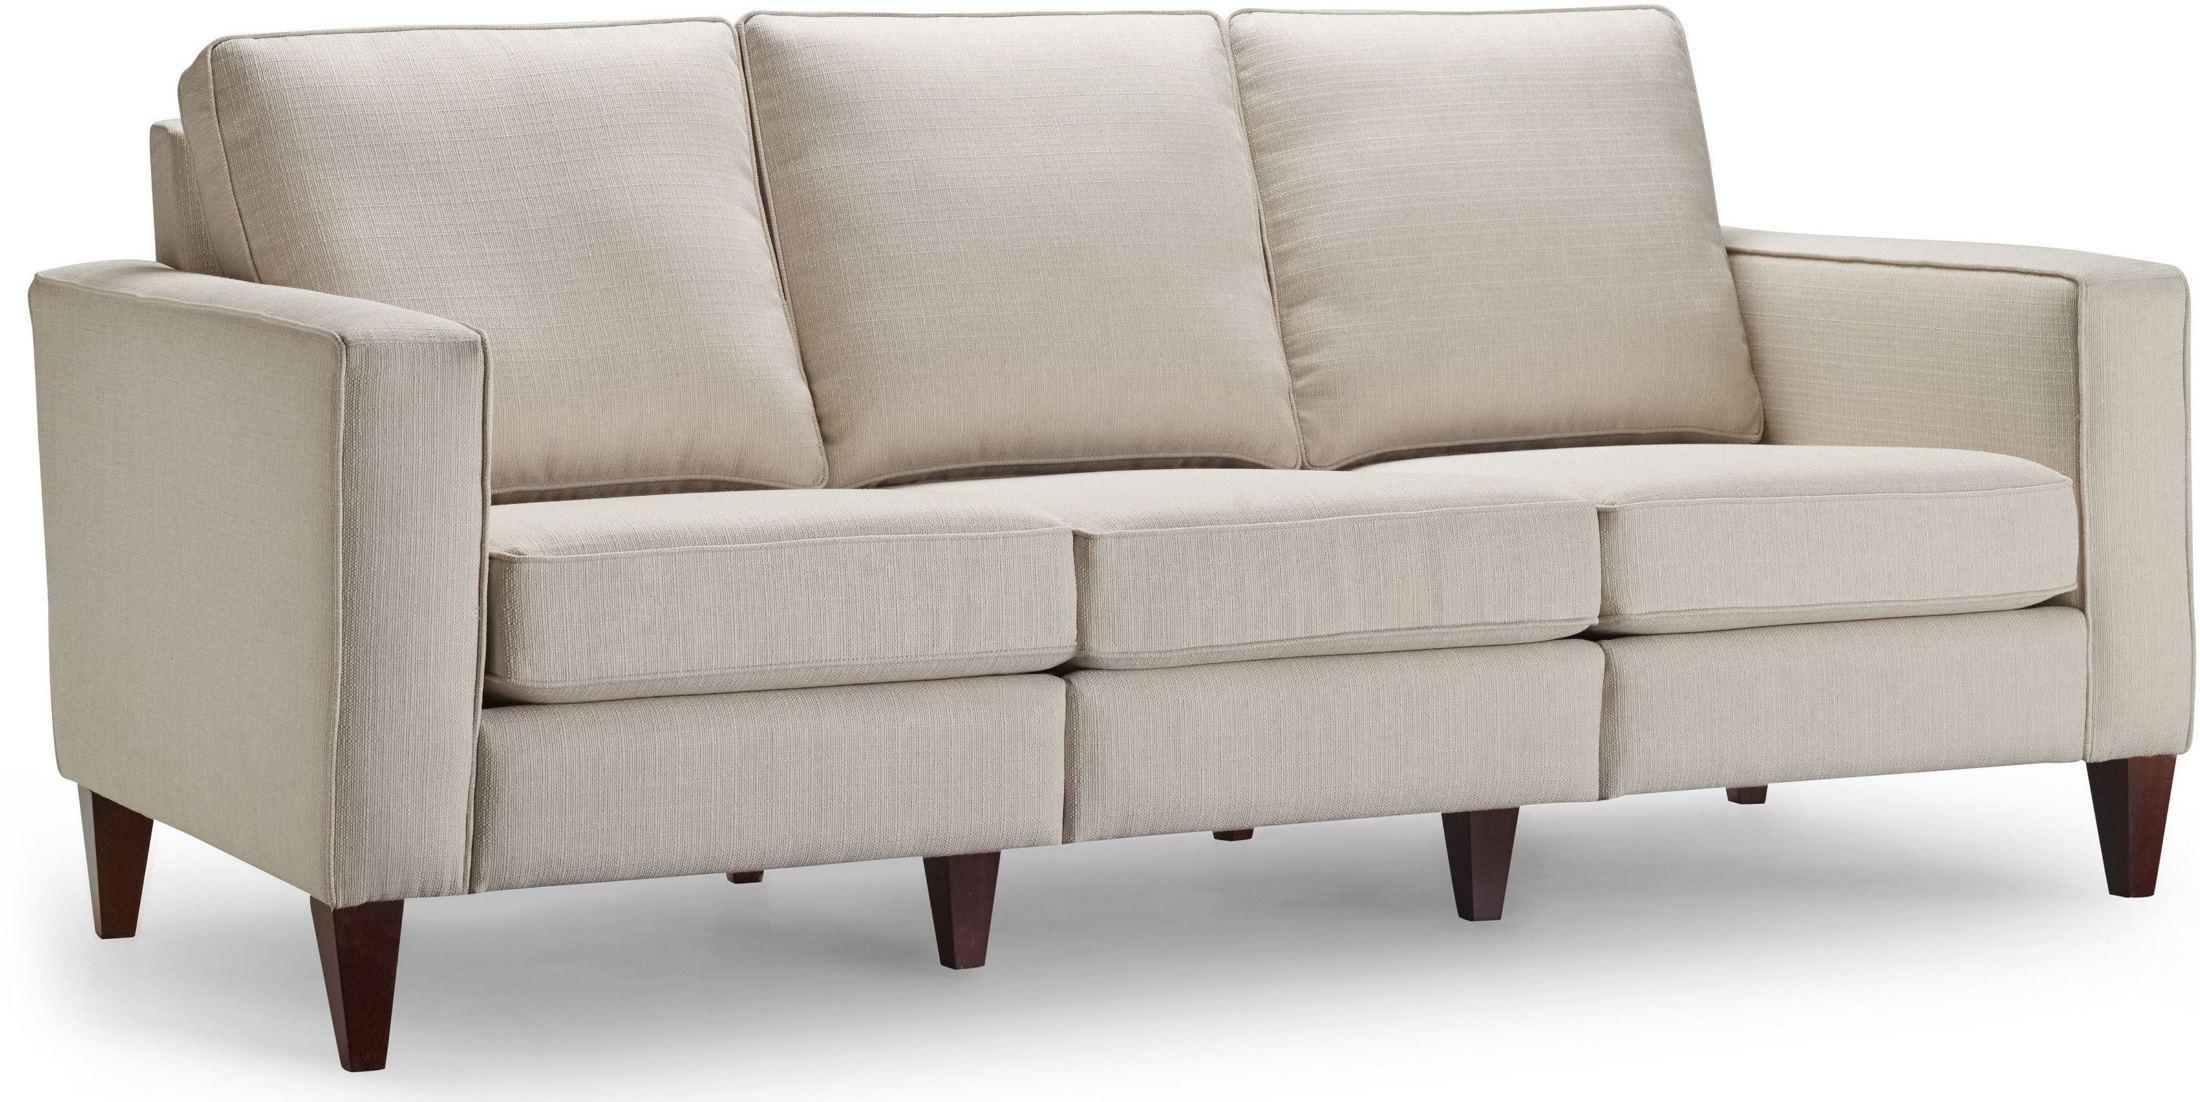 Parker Almond Living Room Set HW1503 02 905BGESO Hooker